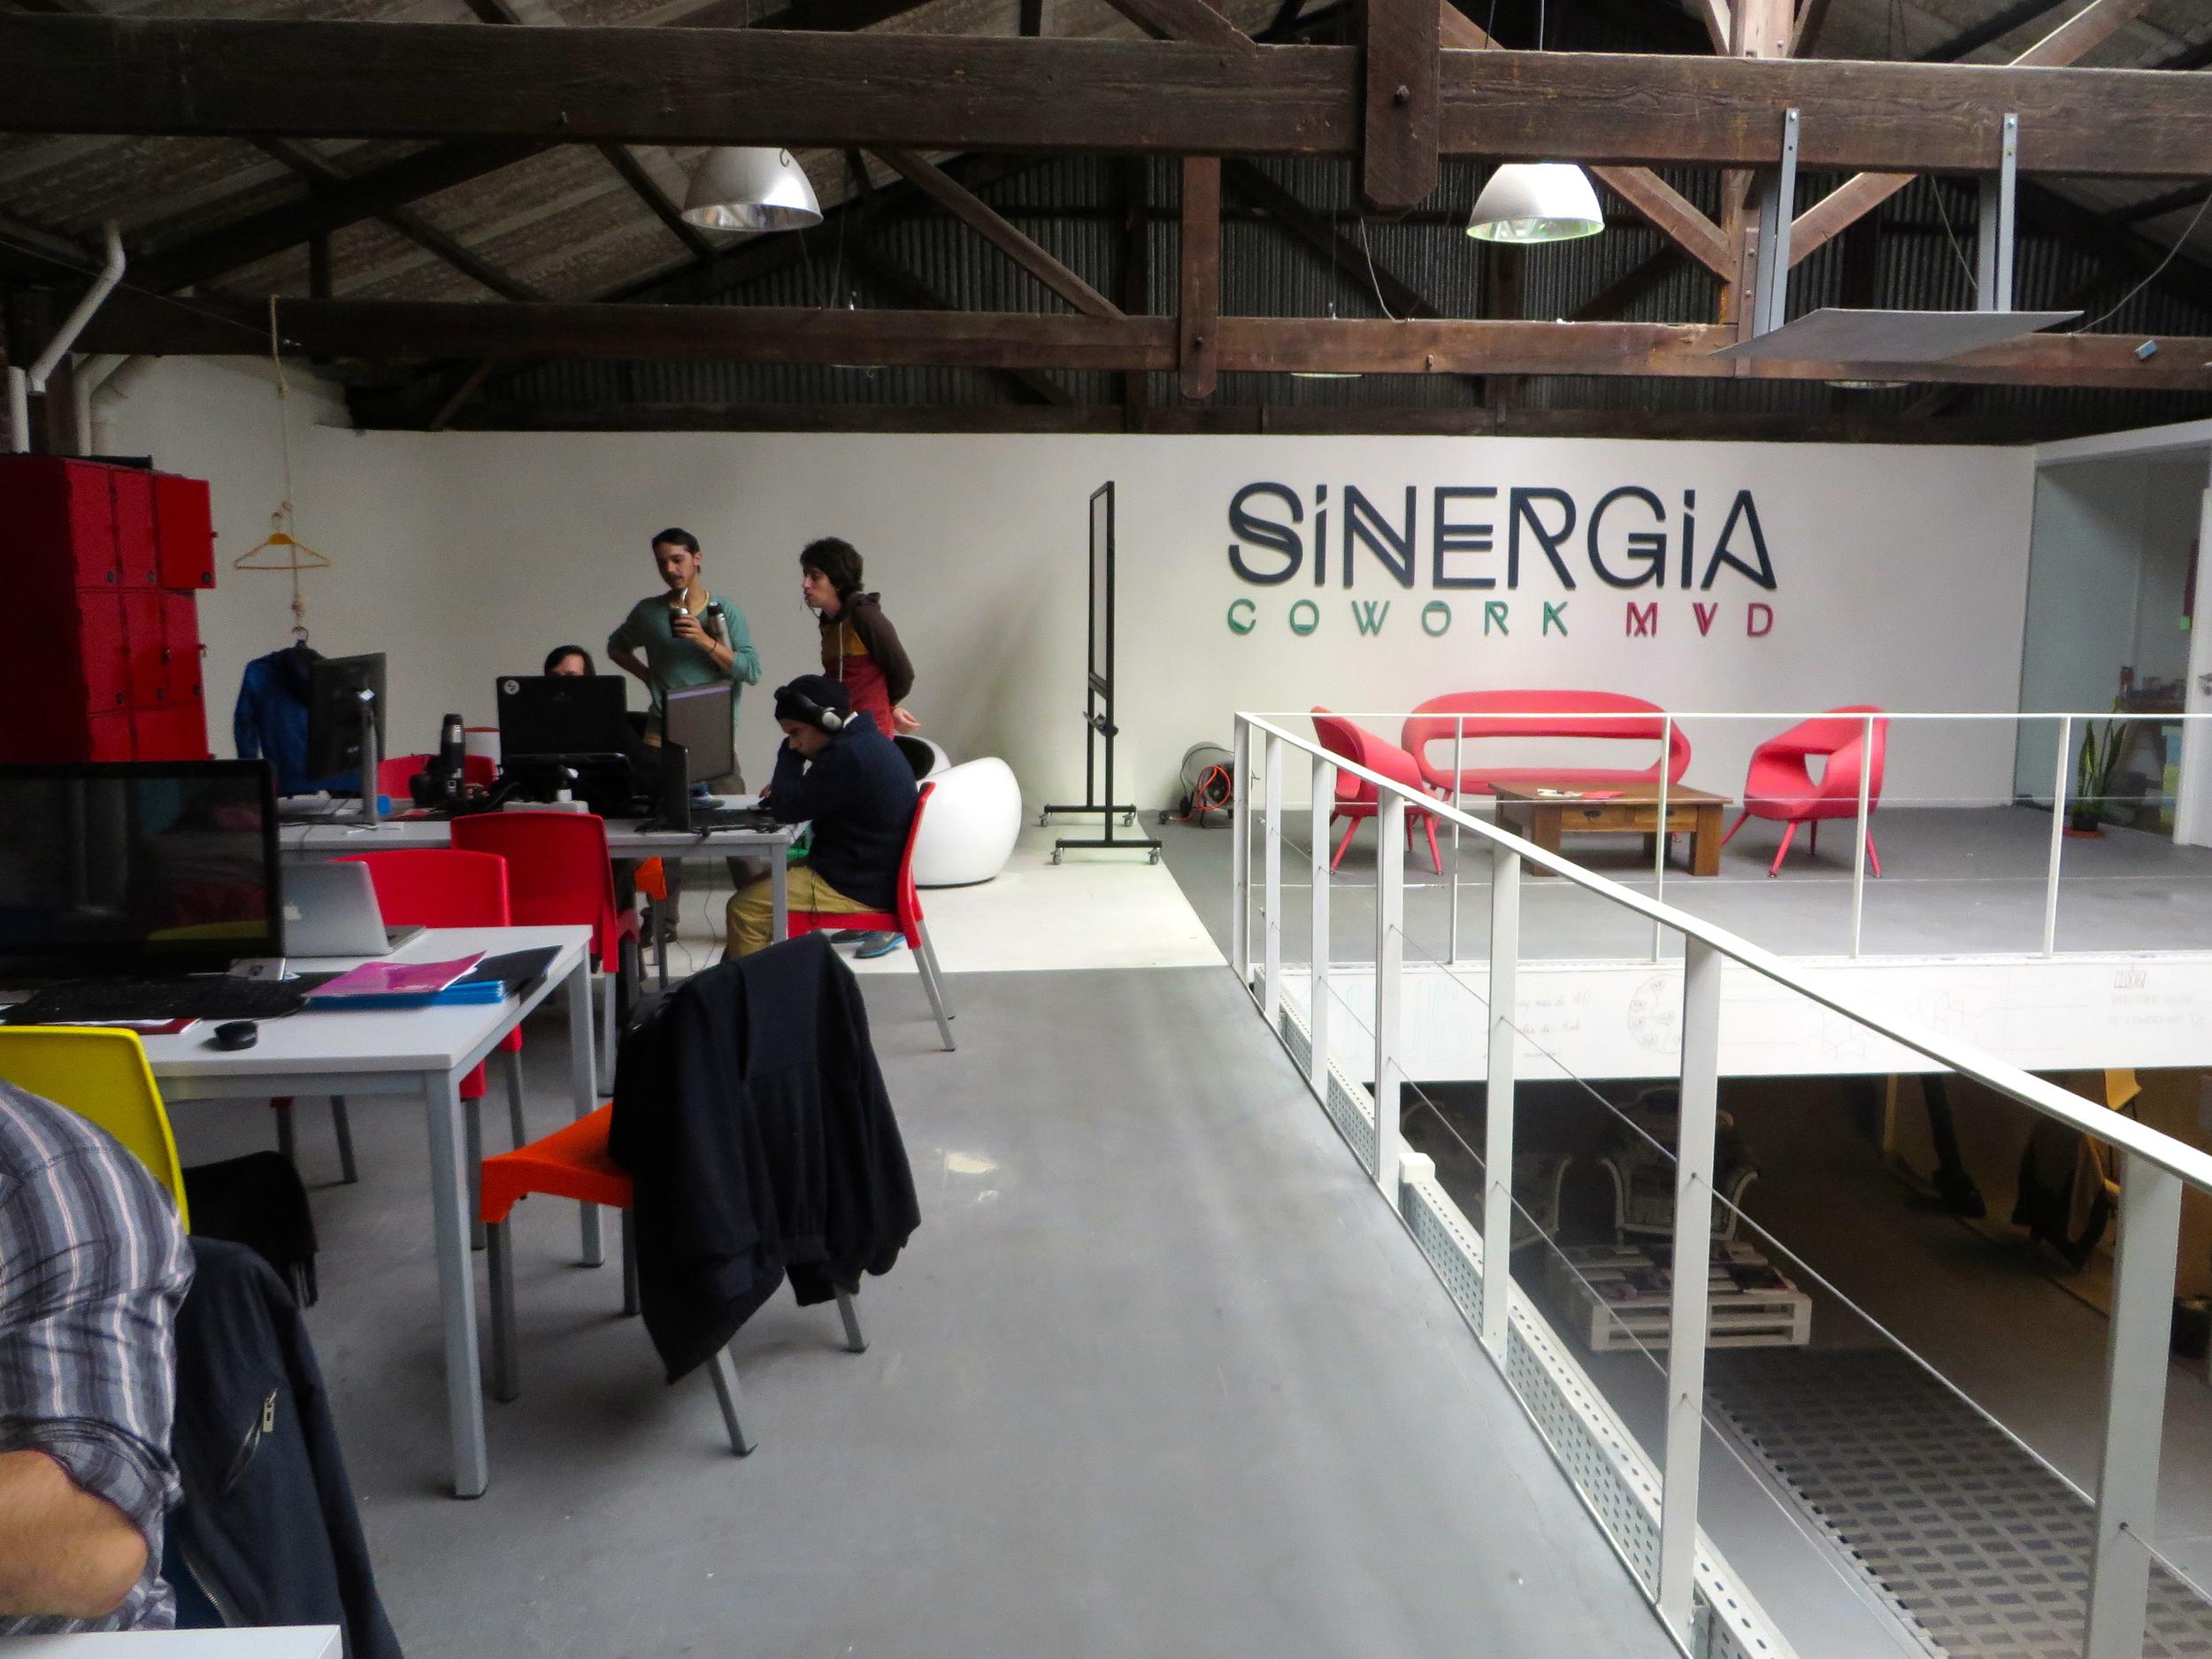 Sinergia co work